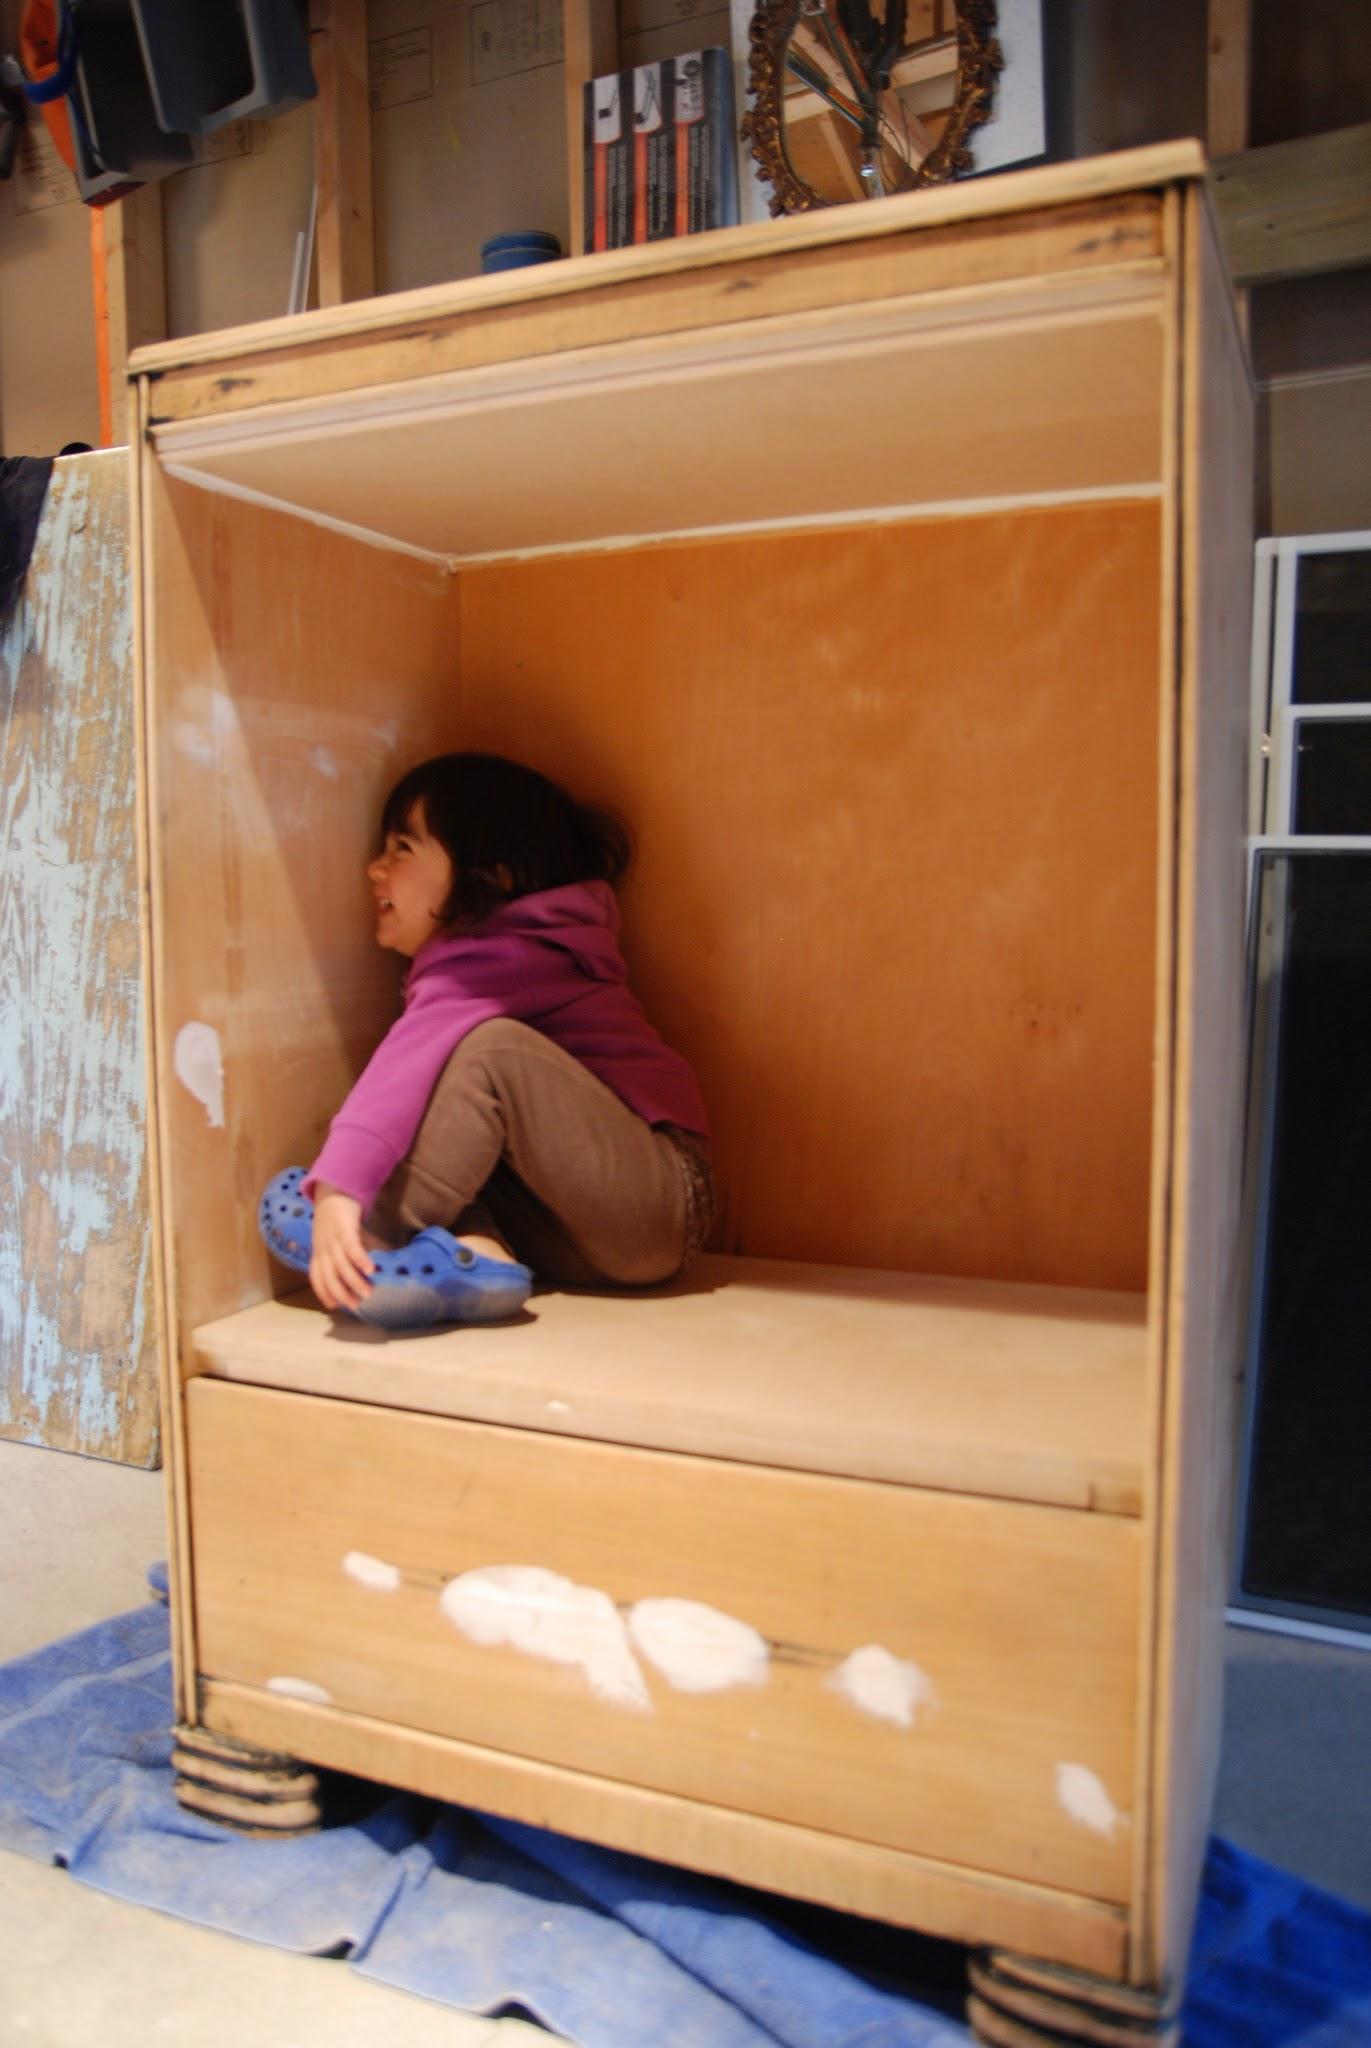 diy kids dress up closet, dresser upcycle, kids playroom storage, costume closet